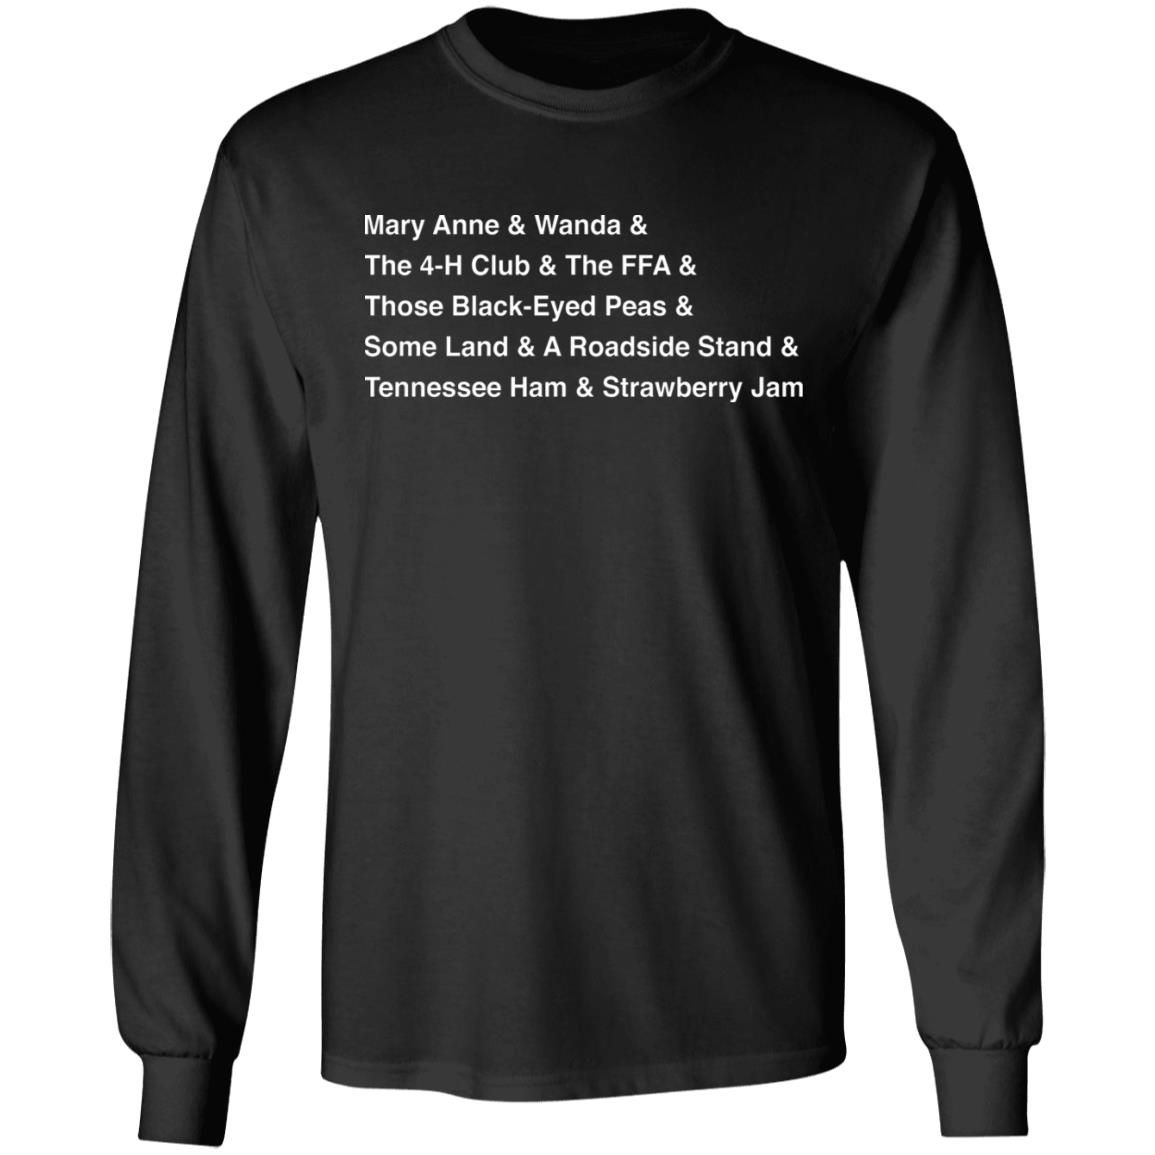 Mary Anne & Wanda shirt